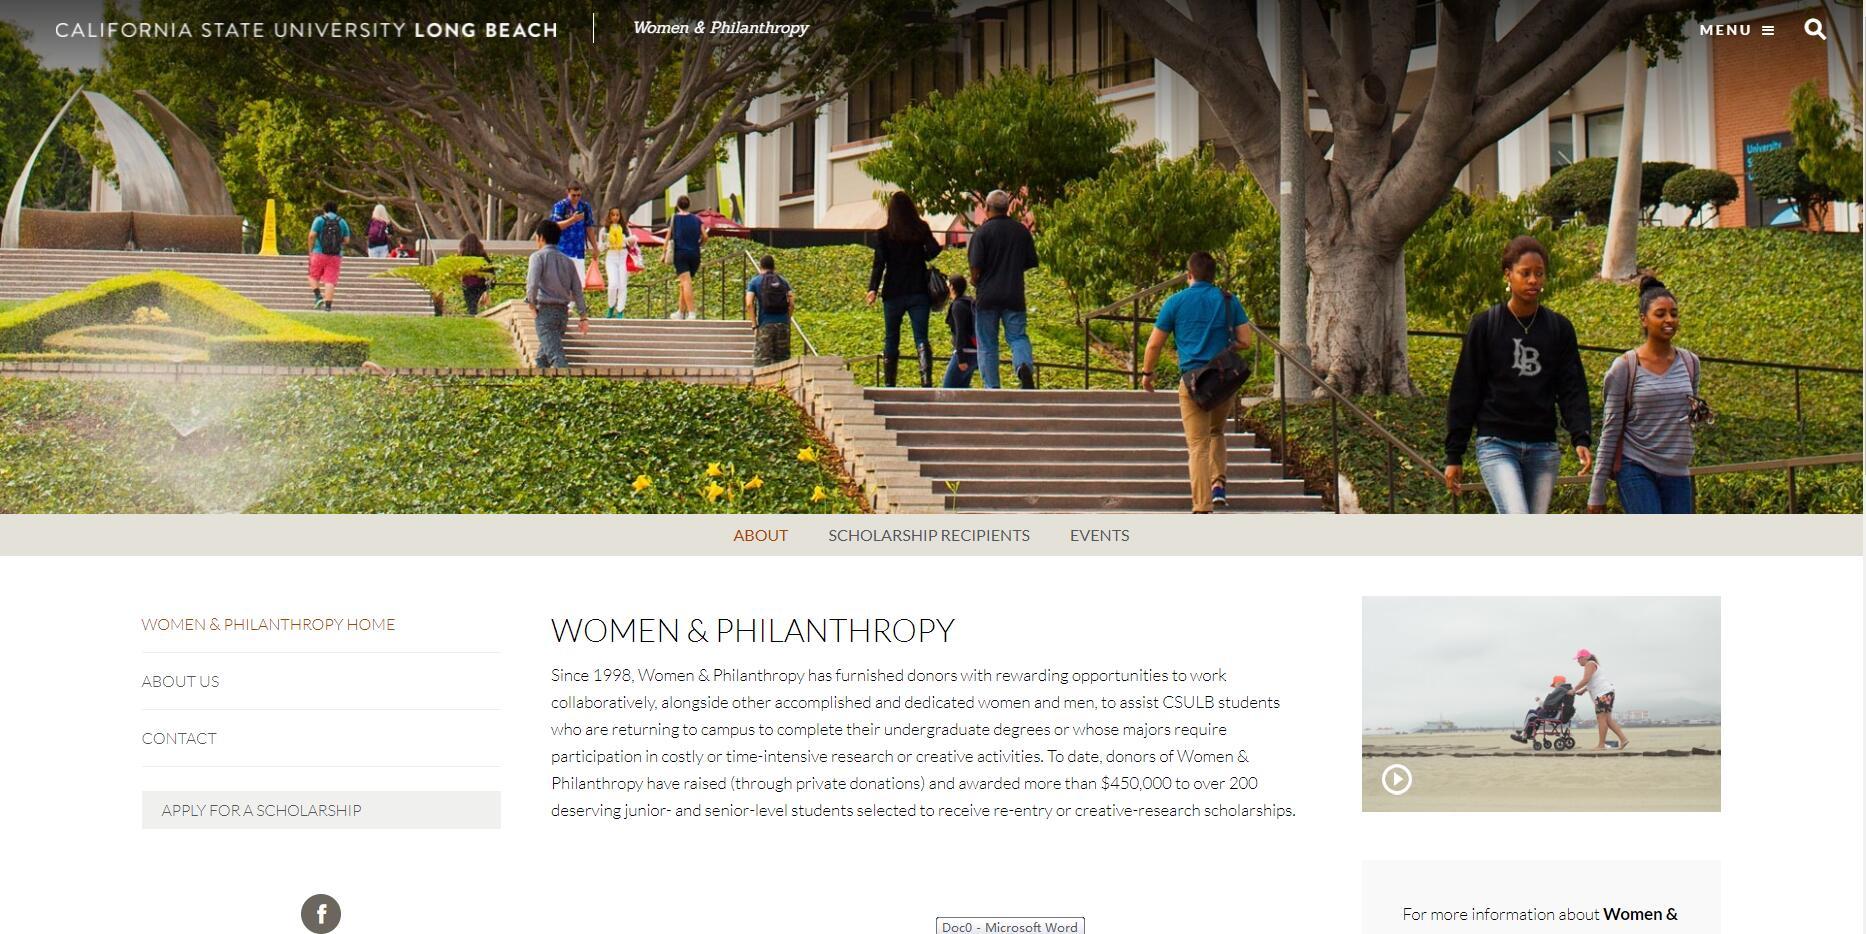 Women & Philanthropy - California State University, Long Beach